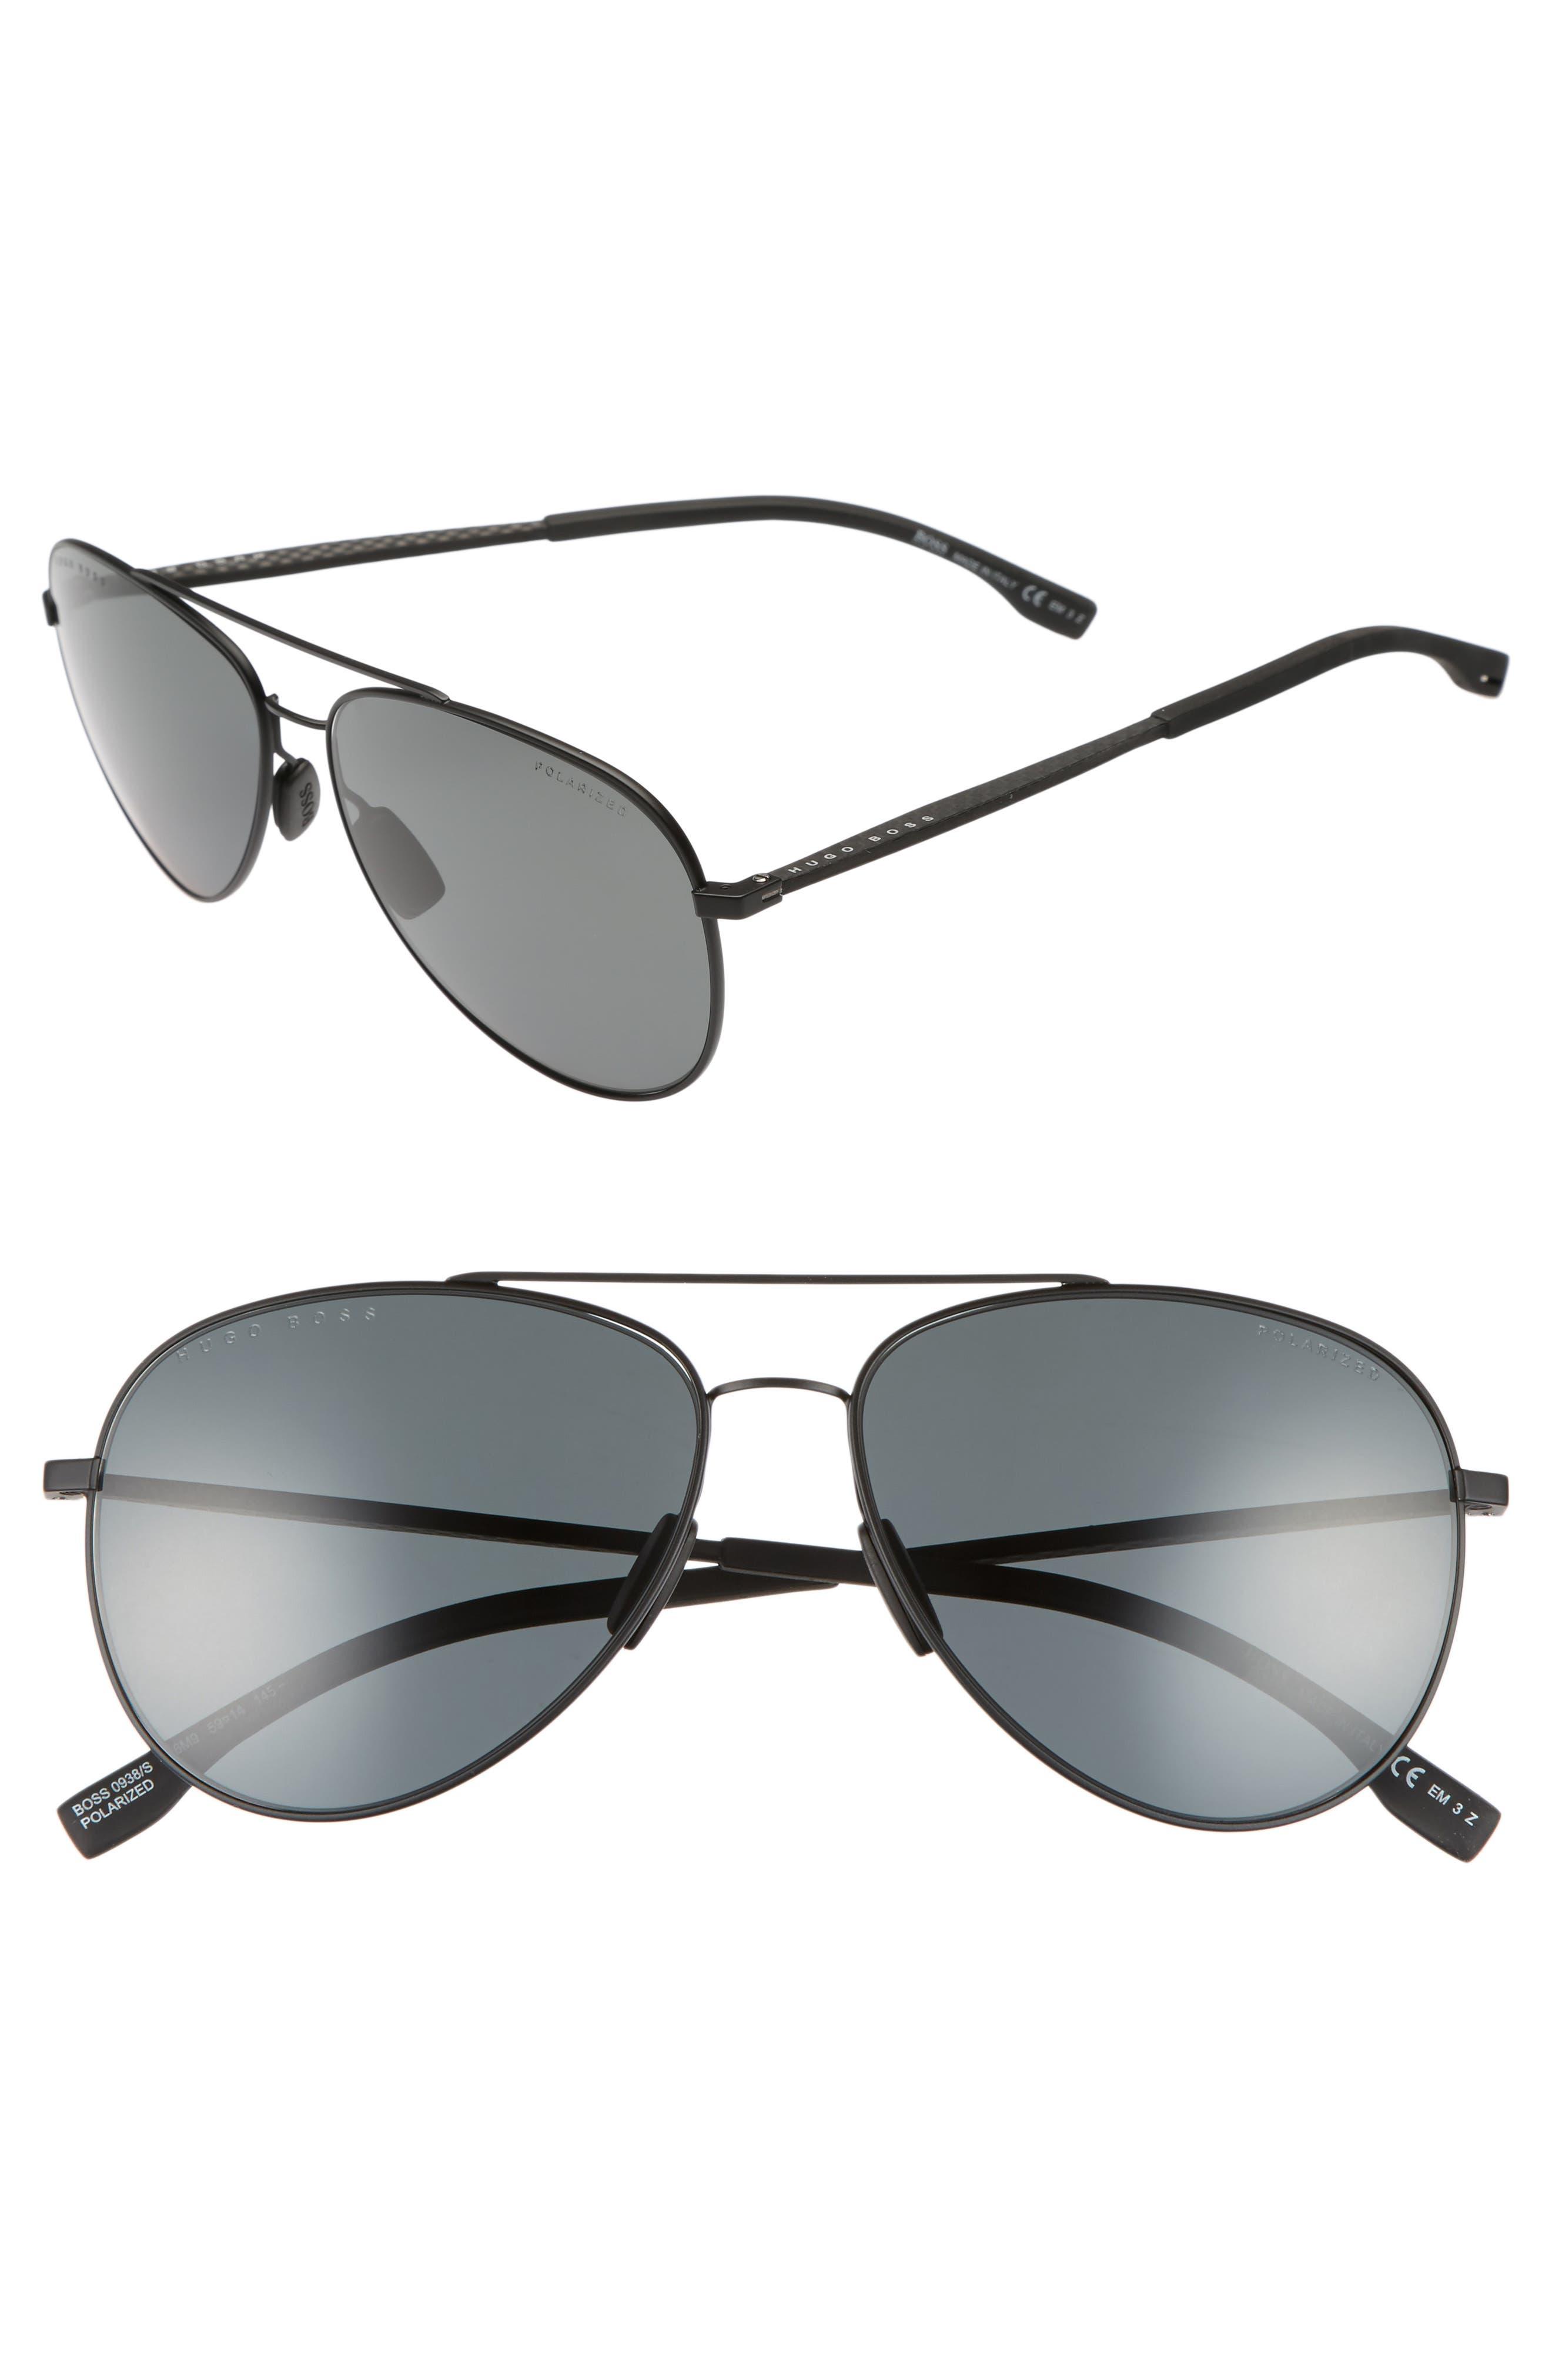 59mm Aviator Sunglasses,                             Main thumbnail 1, color,                             003